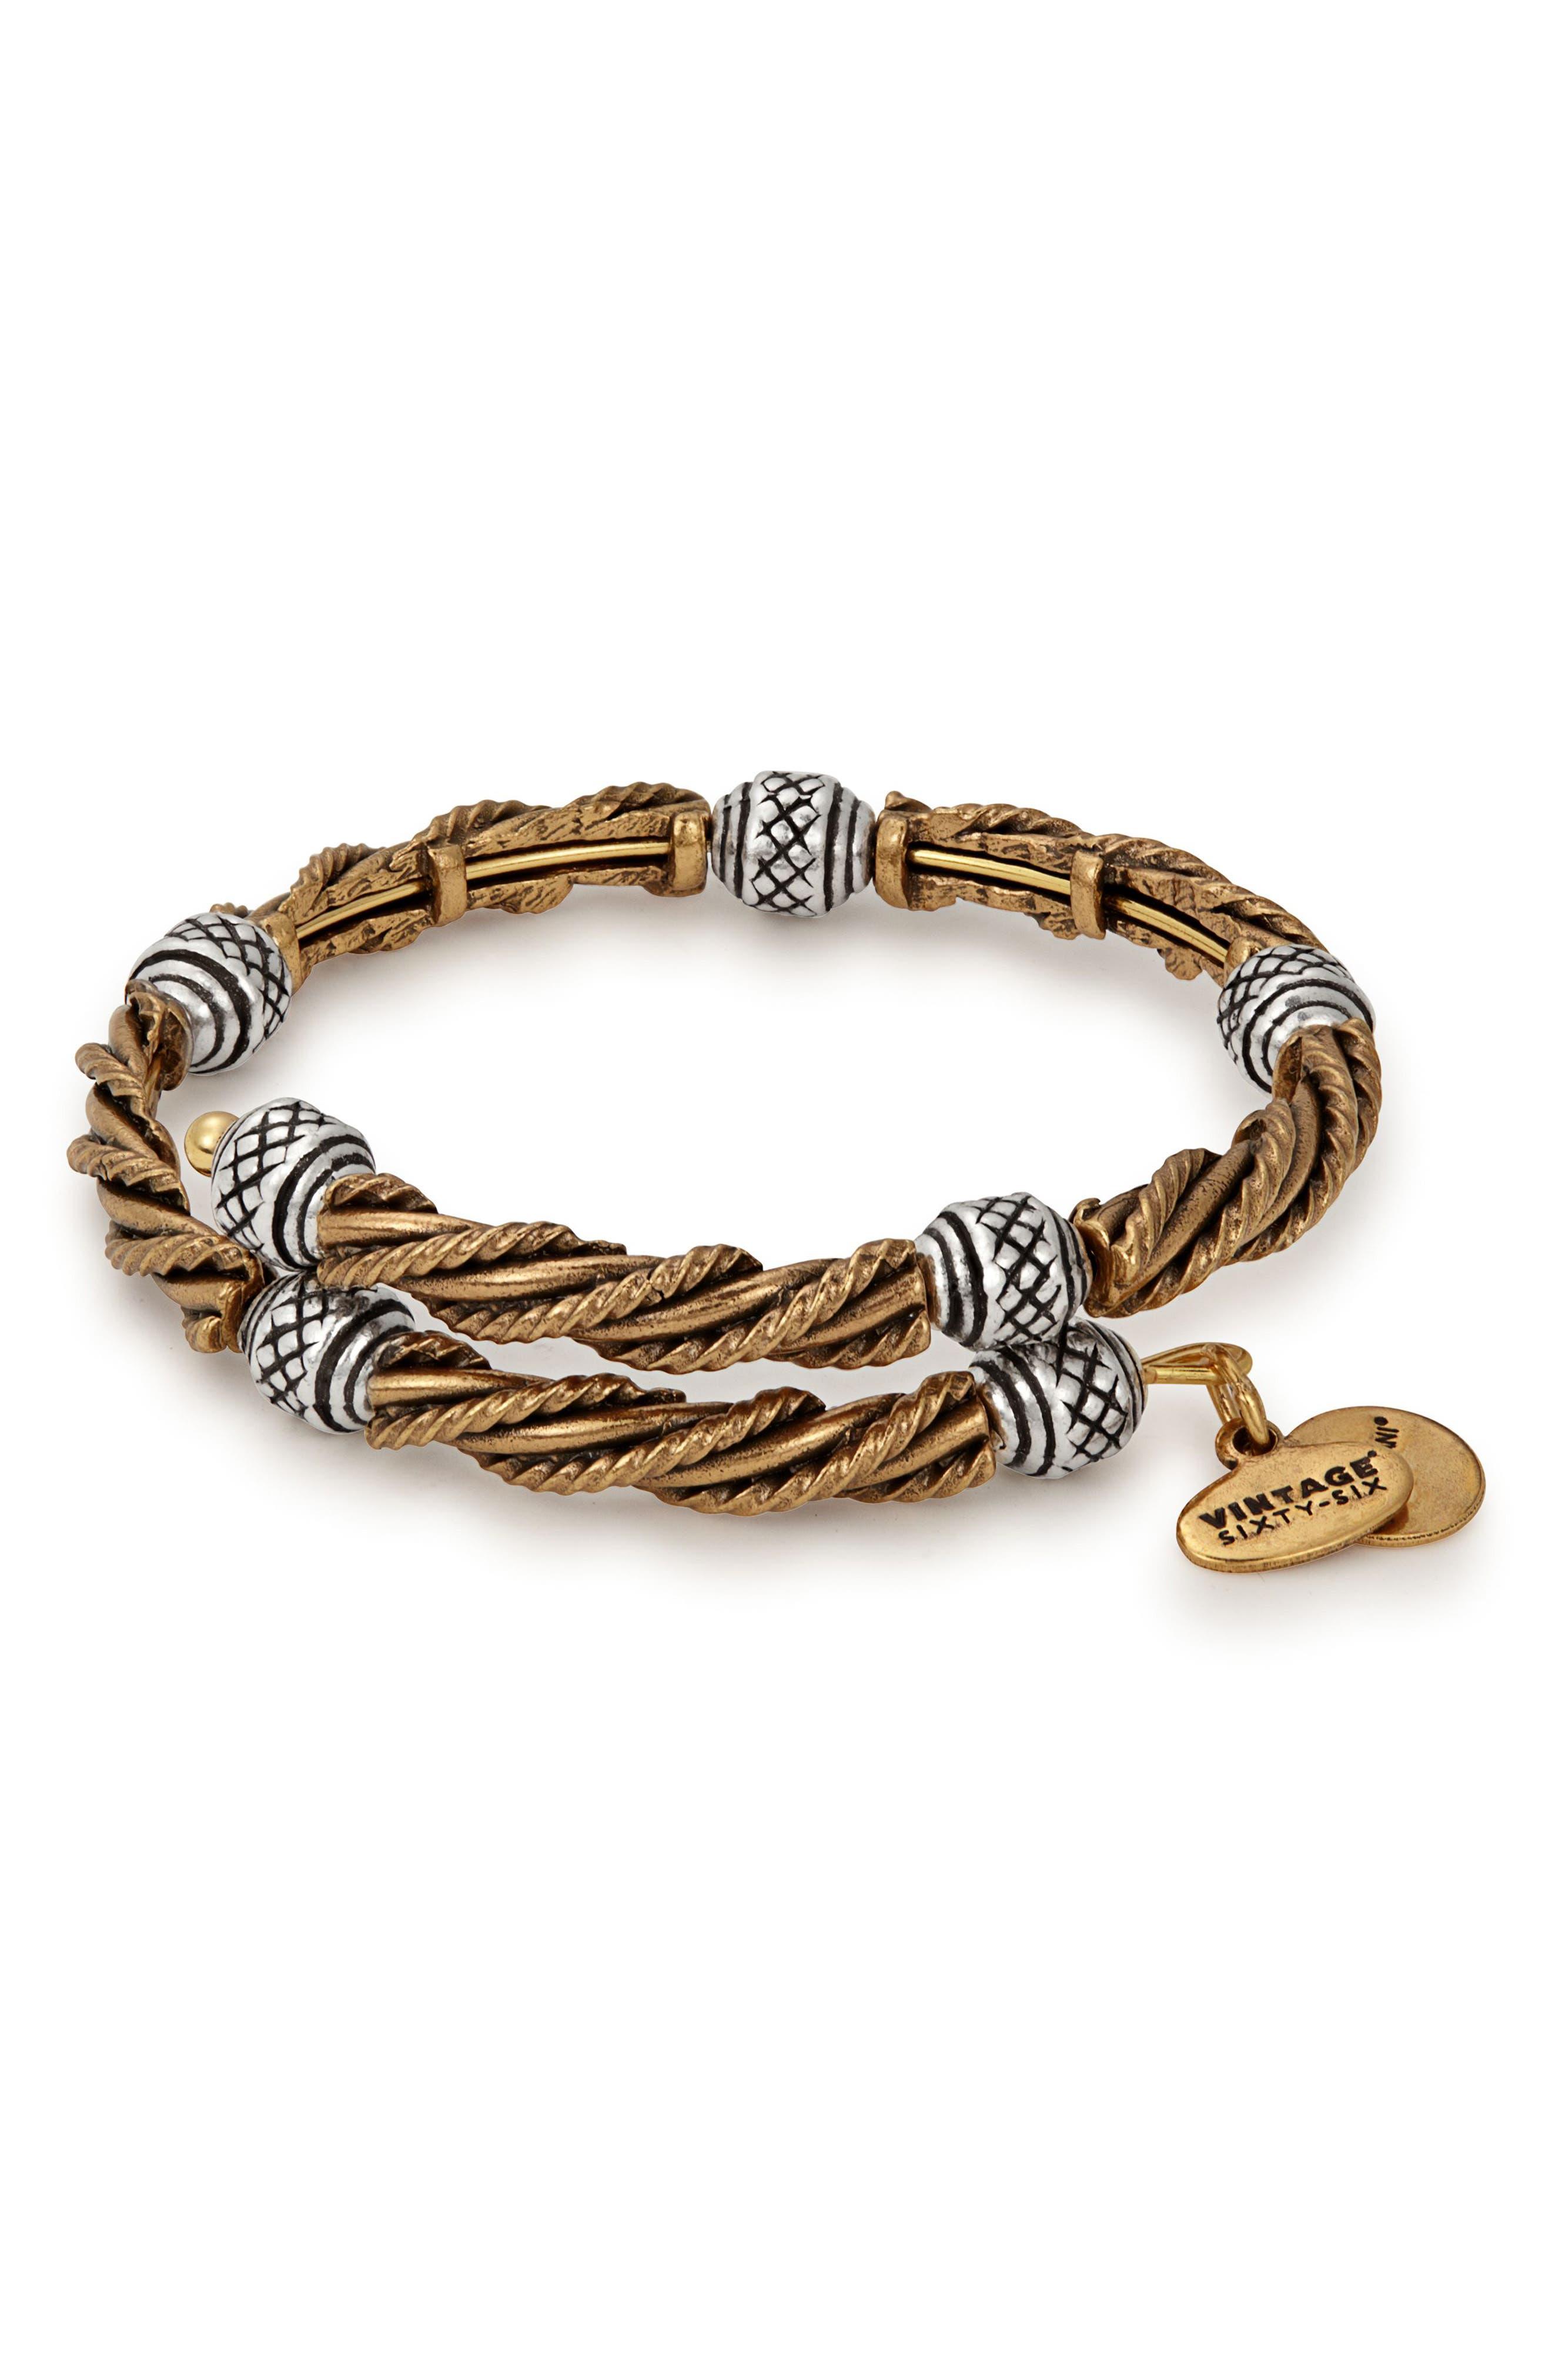 Relic Beaded Wrap Bracelet,                             Main thumbnail 1, color,                             710